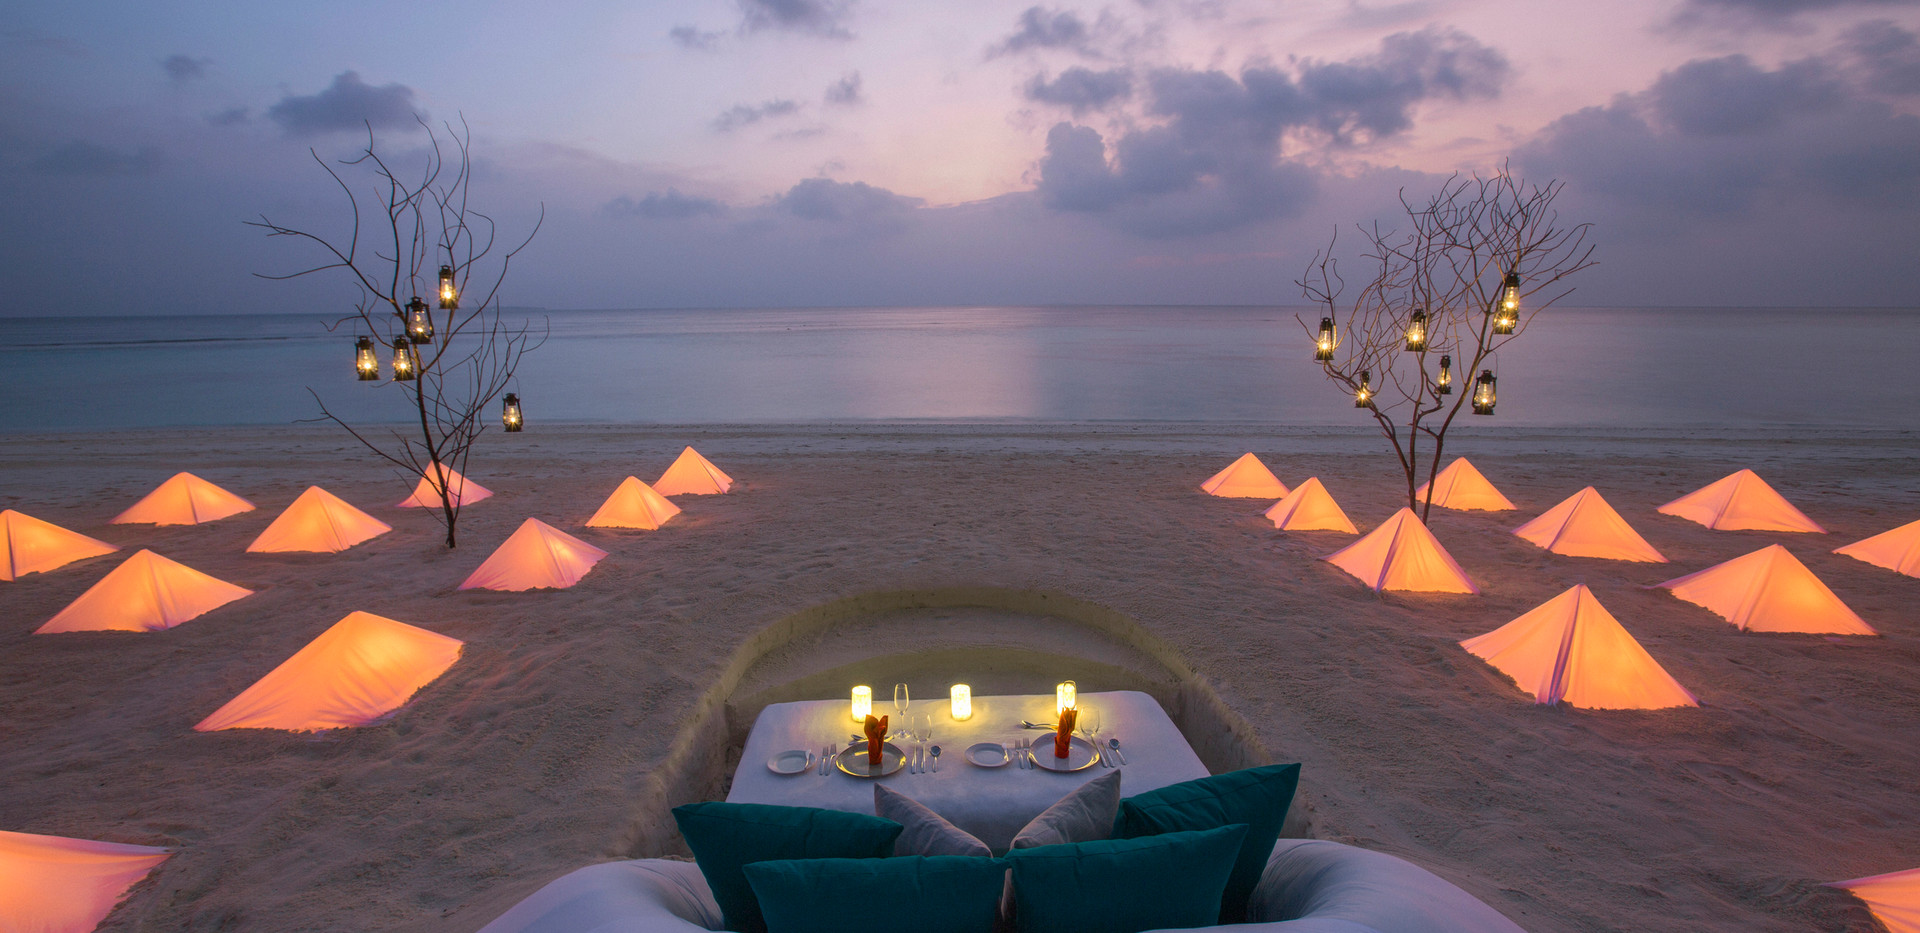 Dusi_Thani_Maldives-7381.jpg